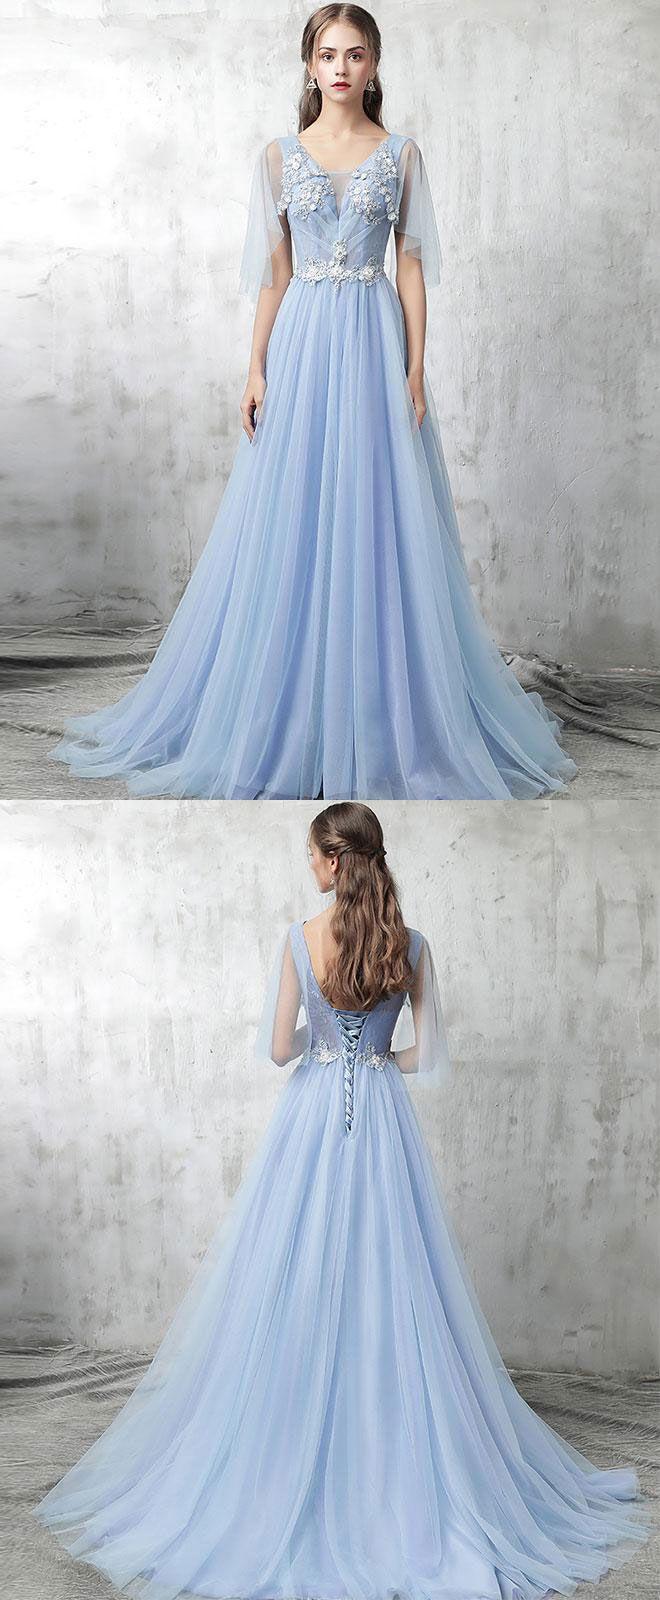 Blue v neck tulle lace applique long prom dress, blue evening dress ...